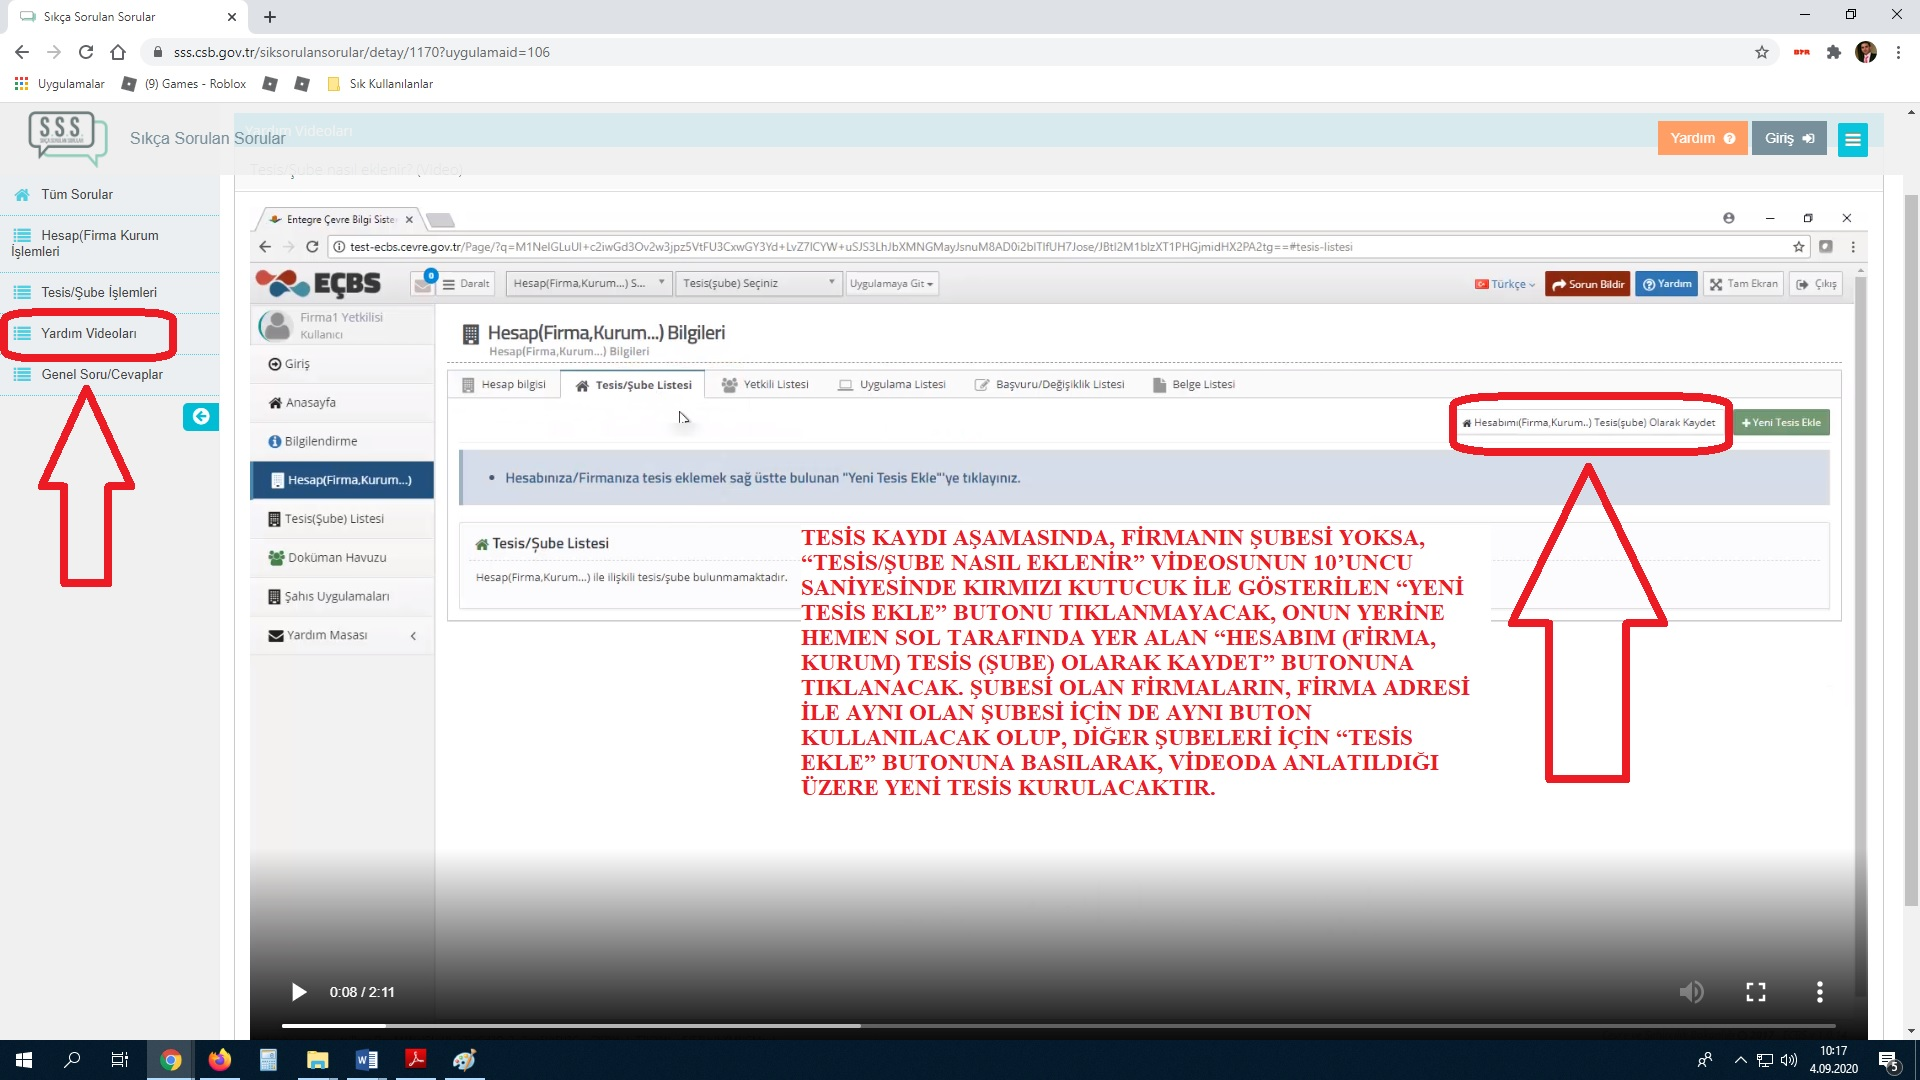 https://webdosya.csb.gov.tr/db/isparta/duyurular/moyden-aciklama-20200904140556.jpg